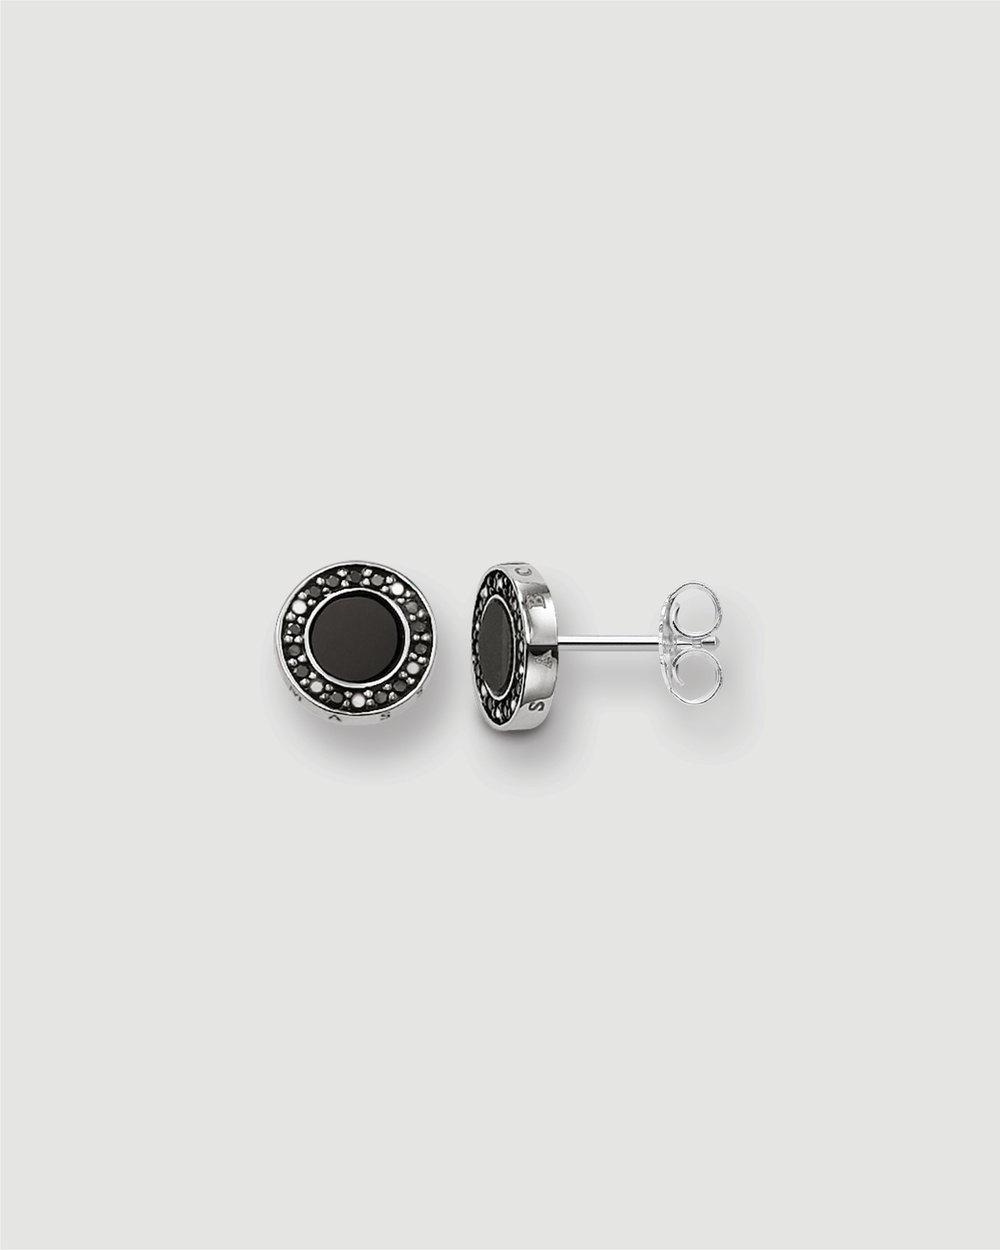 THOMAS SABO Classic Pave Black Ear Studs Jewellery Black